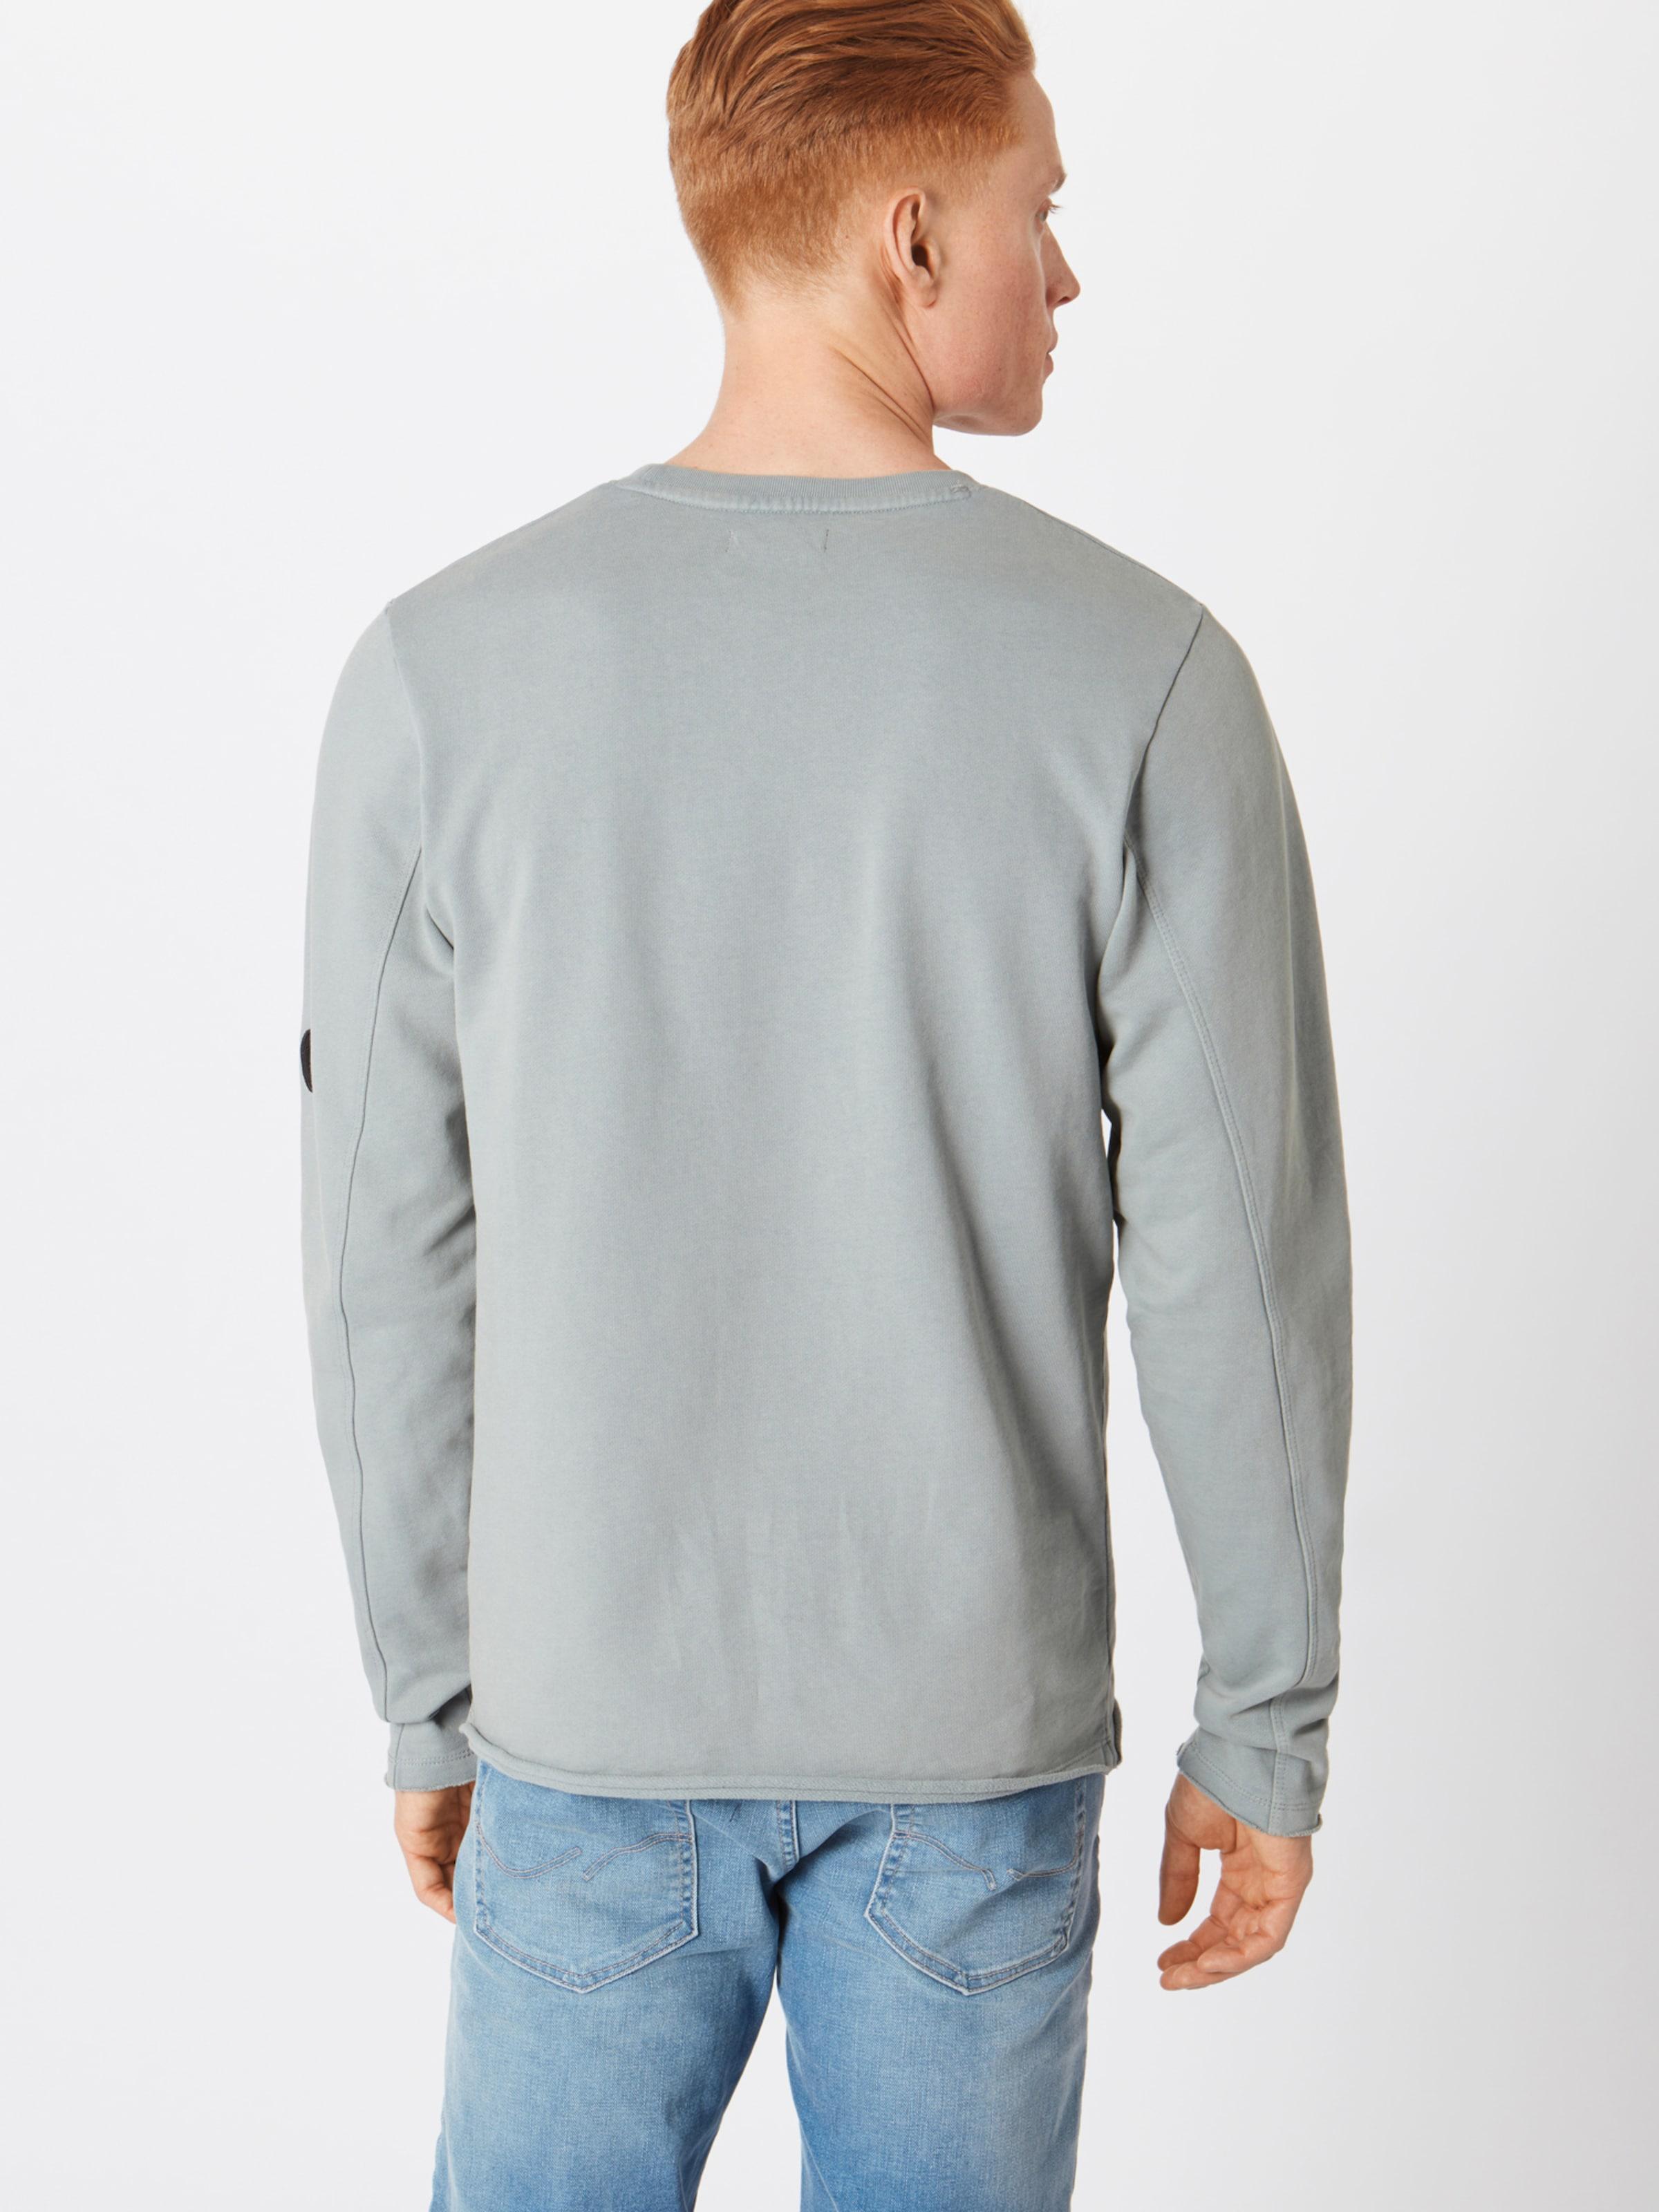 Jackamp; Jones shirt Sweat En Gris Clair nPk8XN0wO